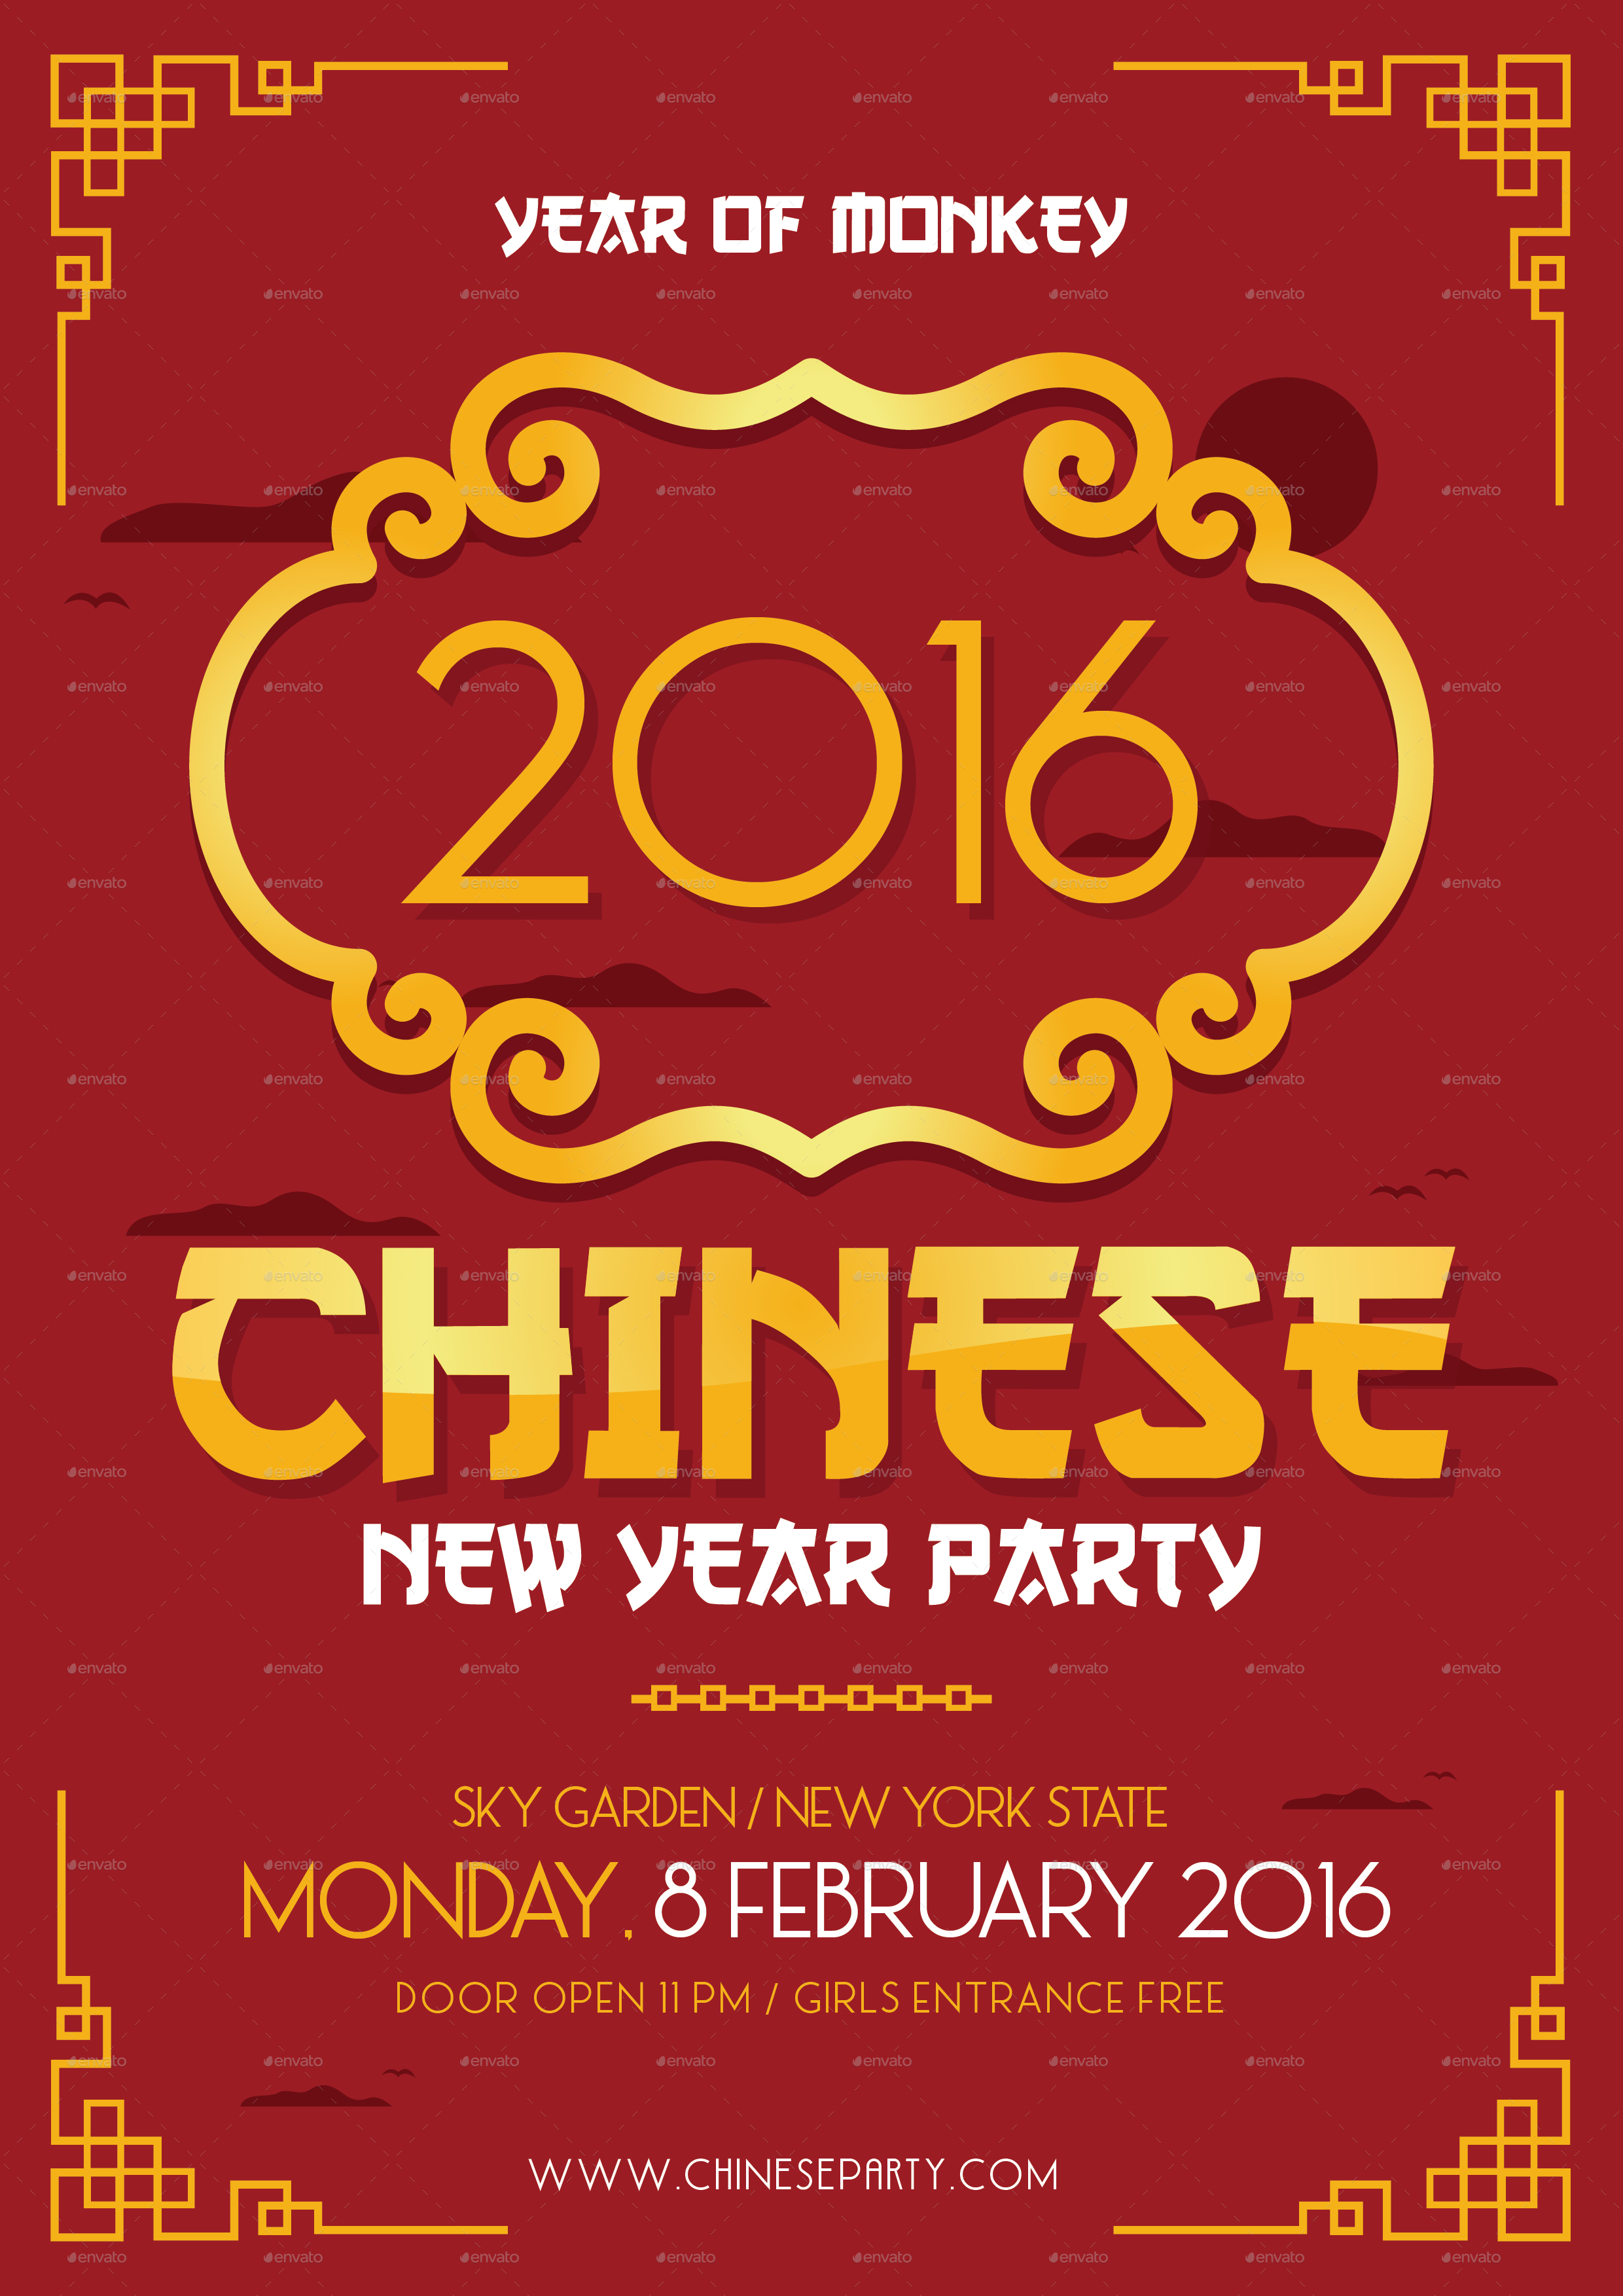 Chinese new year flyer by tokosatsu graphicriver chinese new year flyer events flyers preview image set01chinese flyerg alramifo Gallery